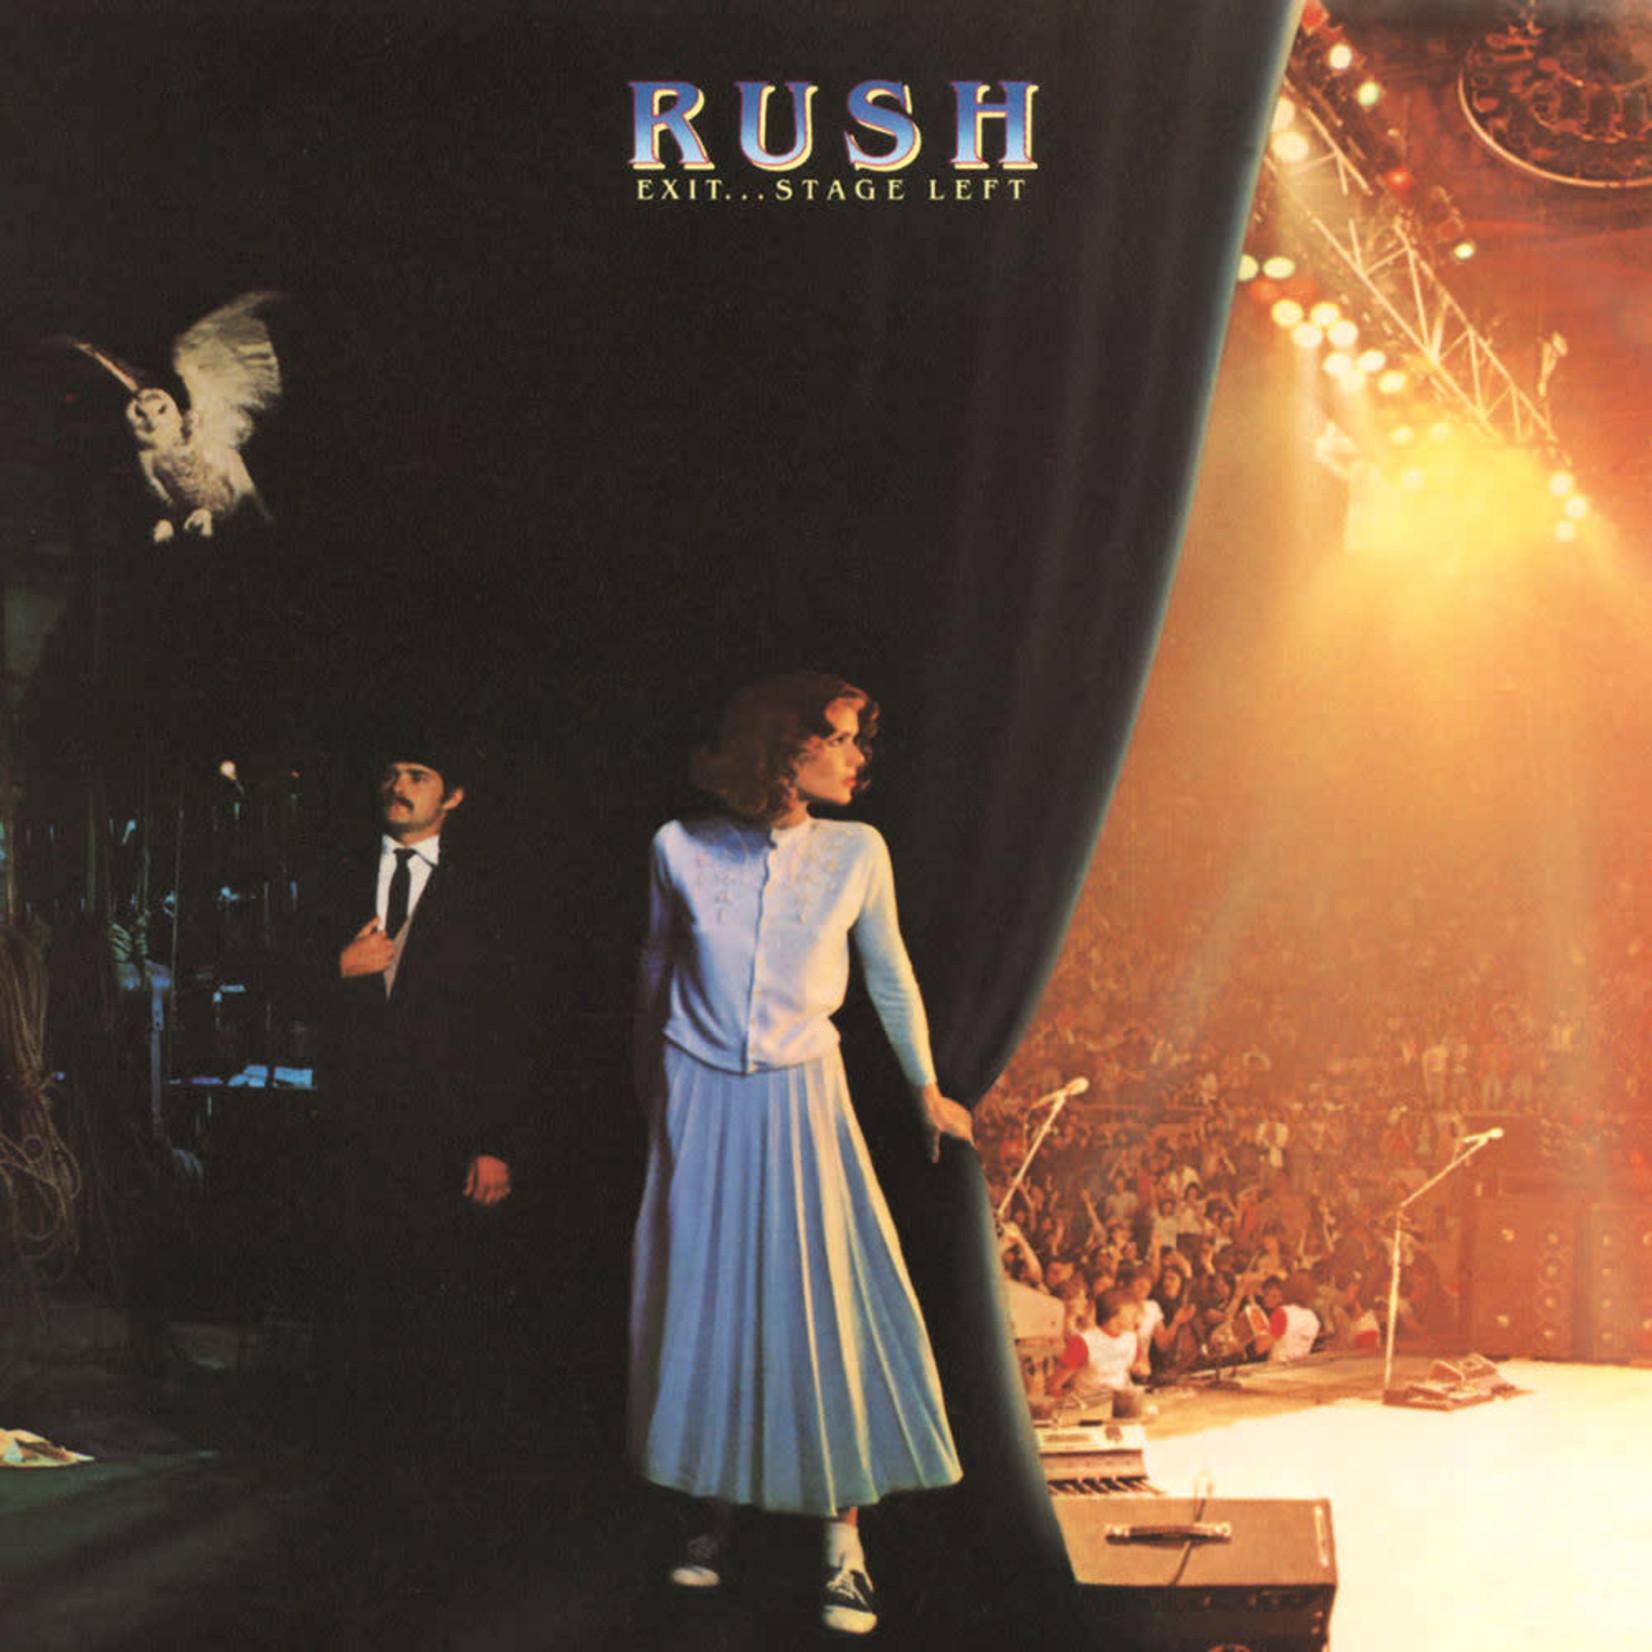 [Vintage] Rush: Exit... Stage Left